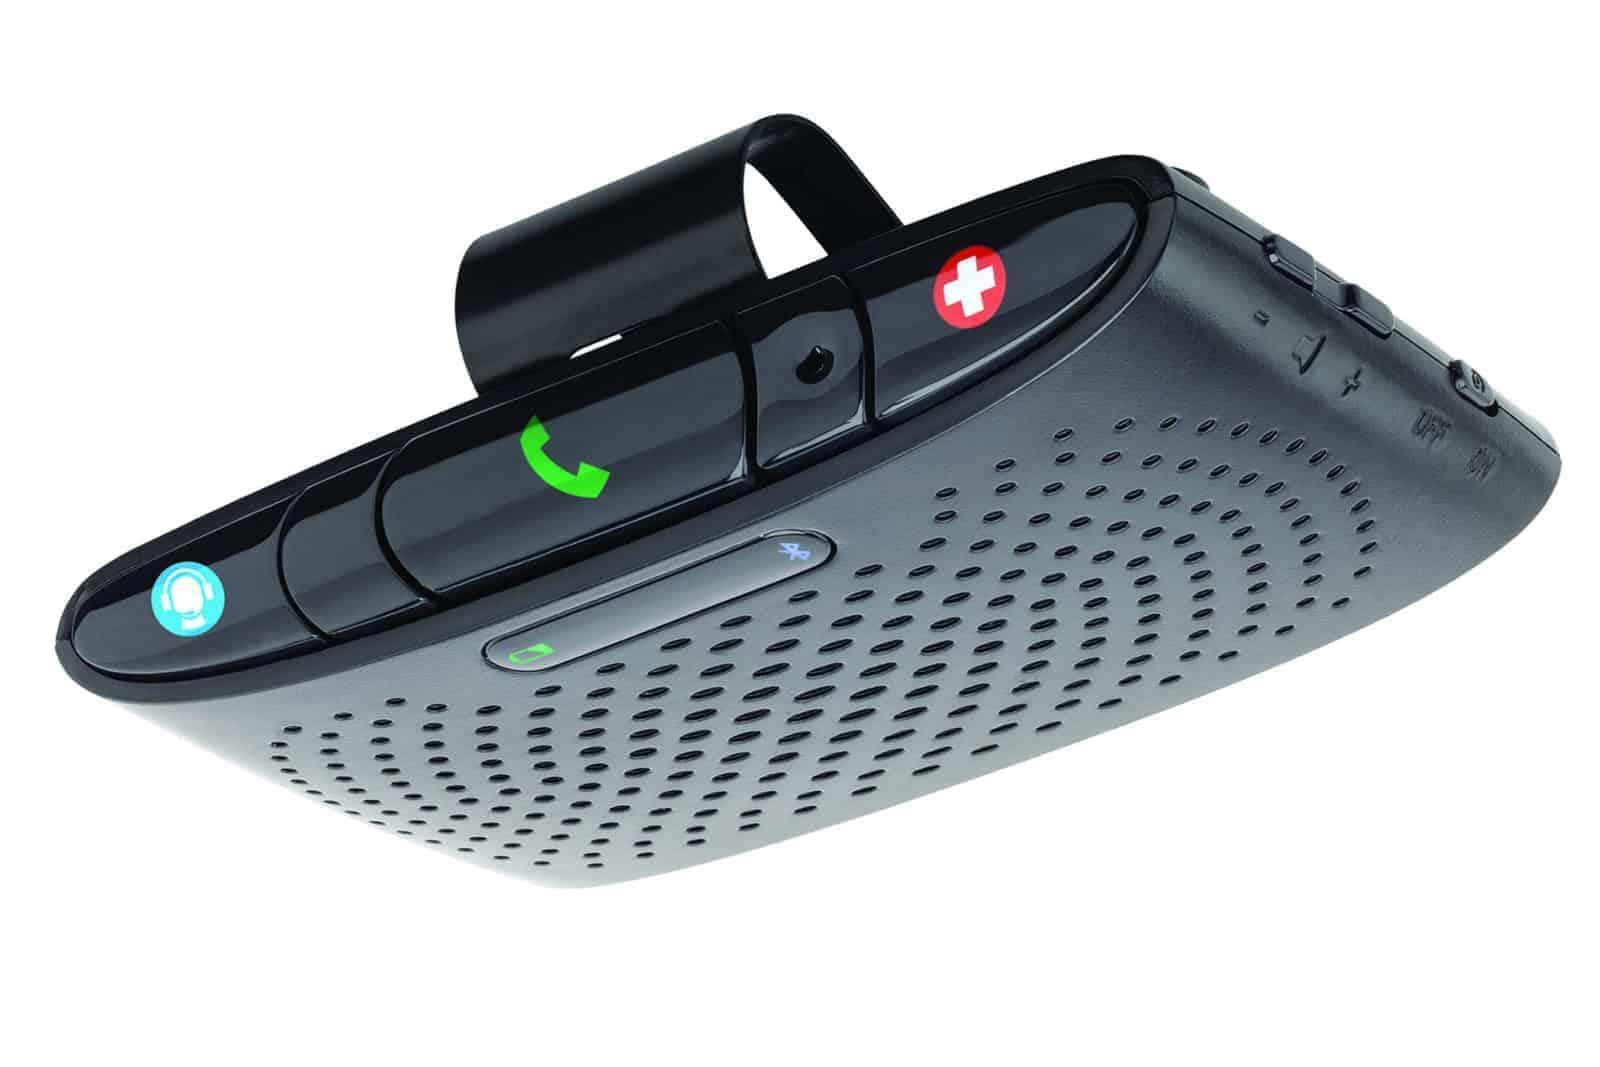 verizon 39 s hum vehicle hub gets a price drop android news. Black Bedroom Furniture Sets. Home Design Ideas